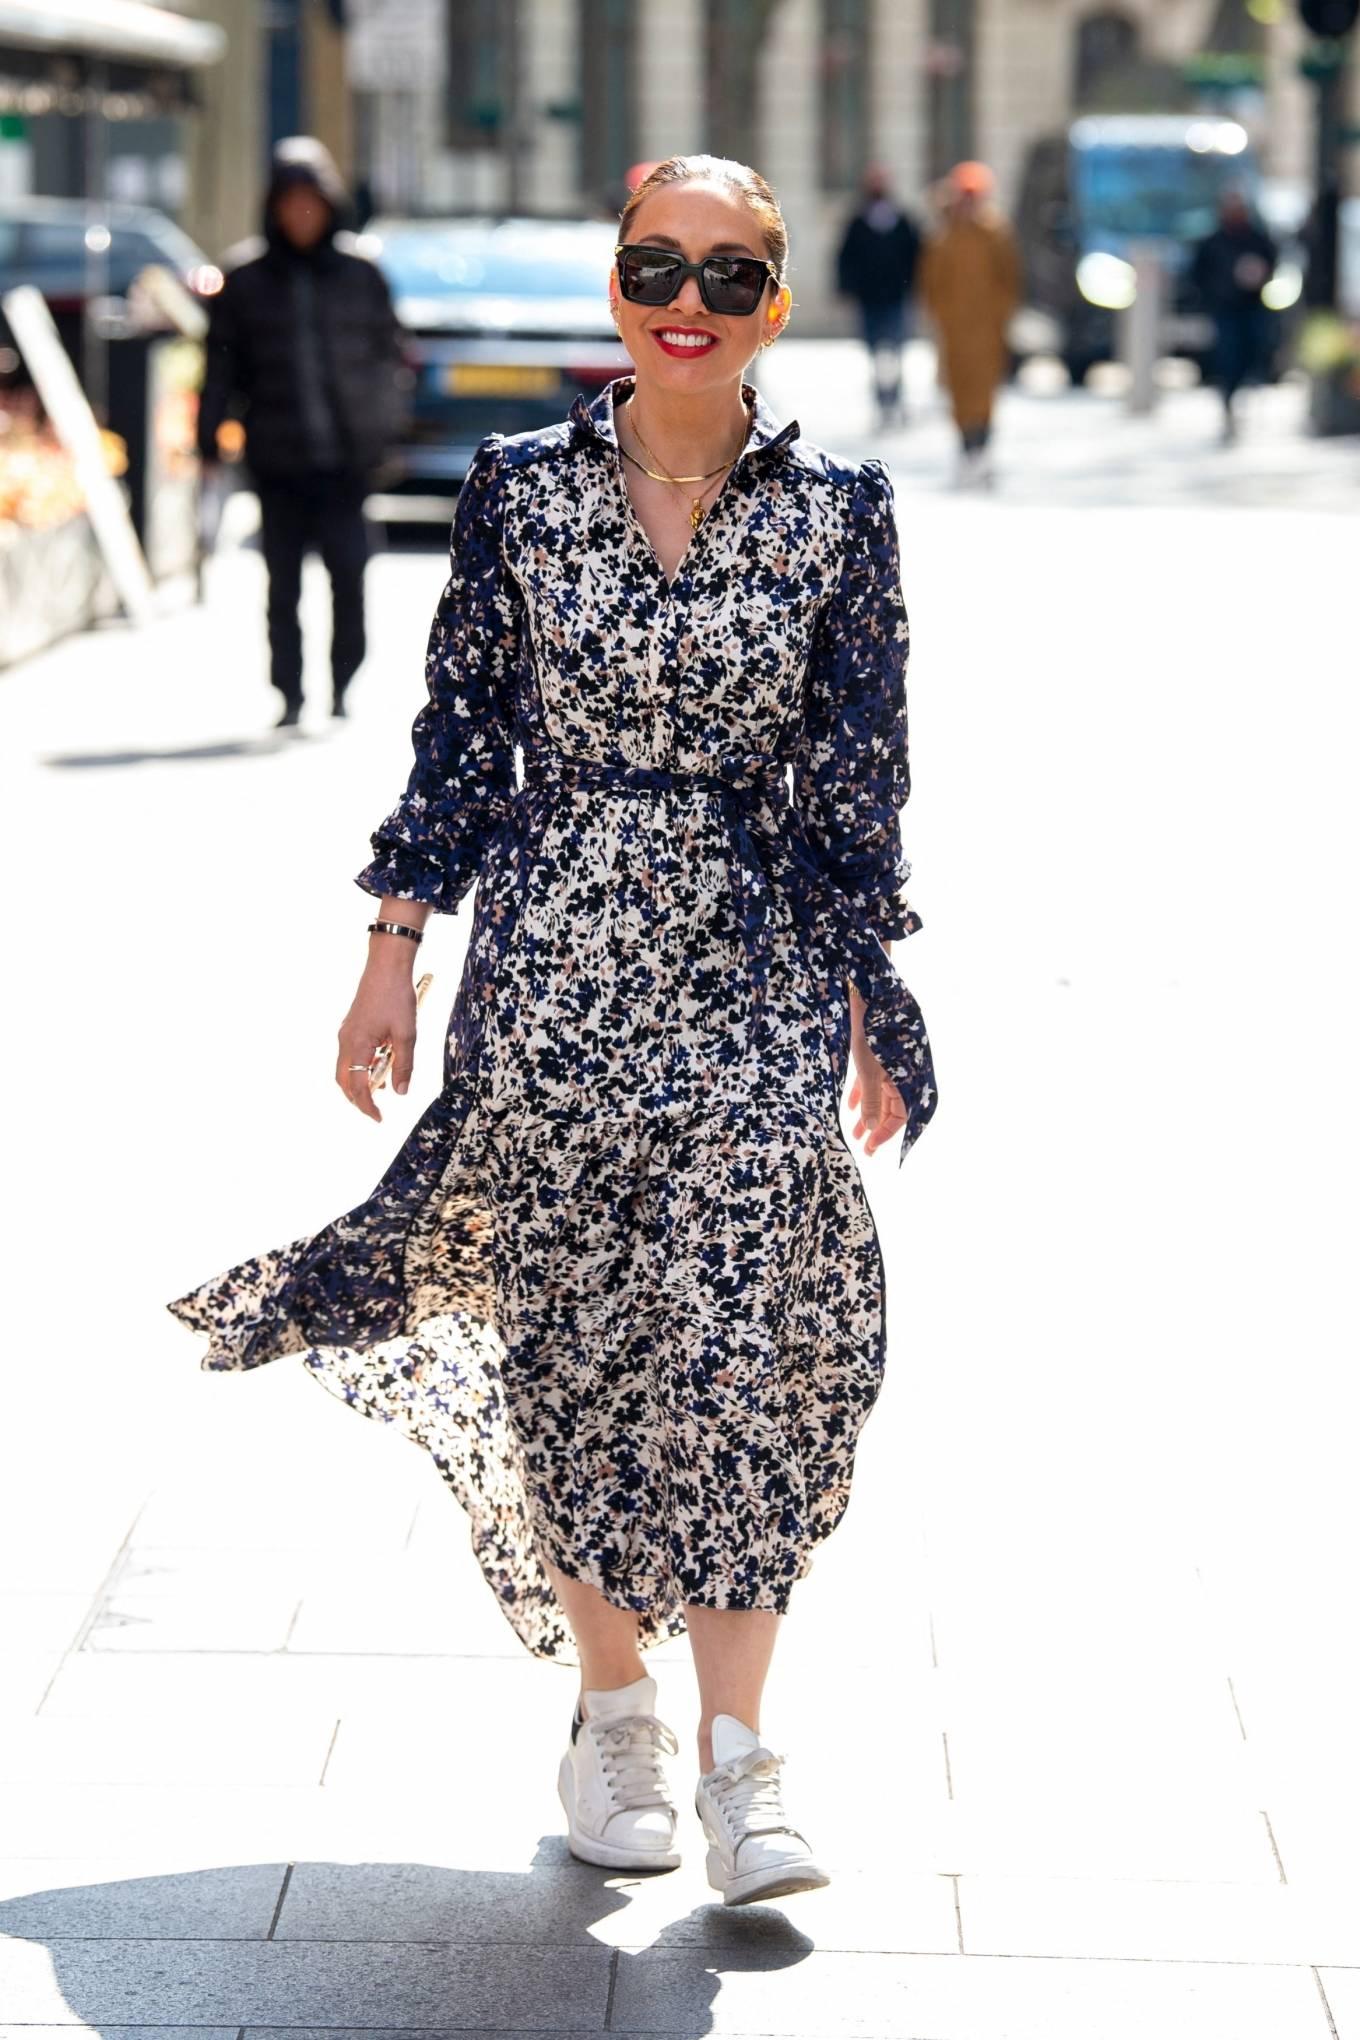 Myleene Klass 2021 : Myleene Klass – In a long summer dress arriving at the Global studios -11